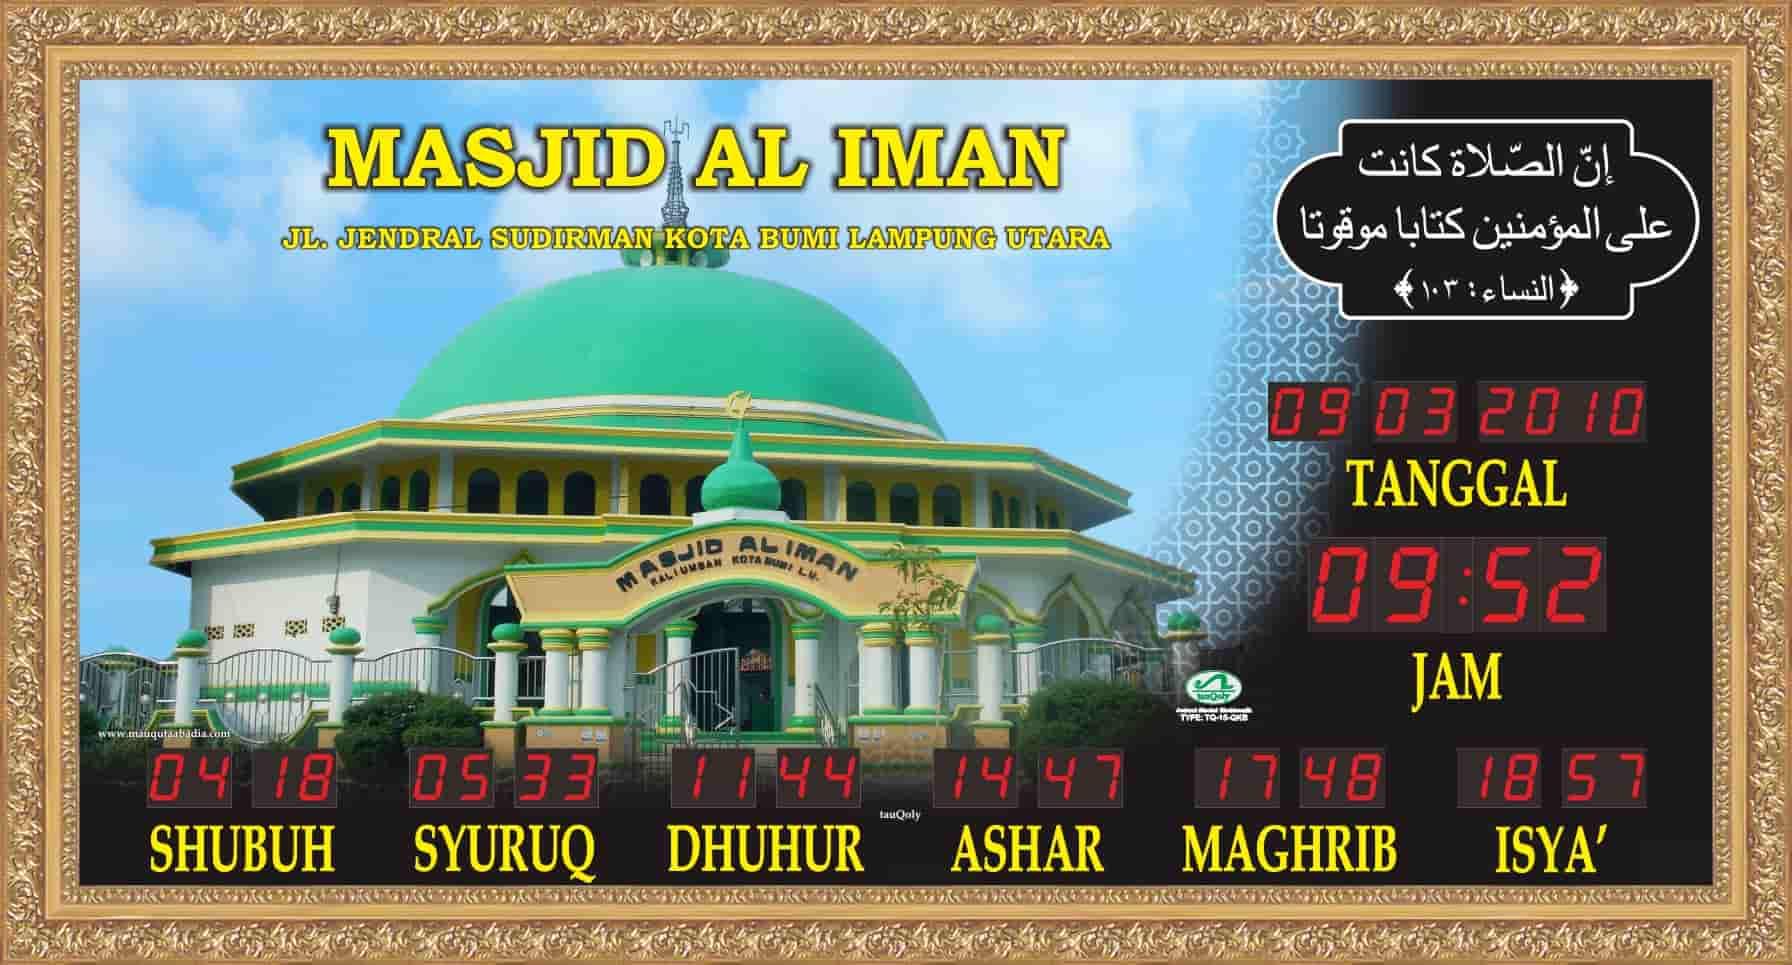 Jam-Digital-untuk-Masjid-TQ-15-QFK-67×127.jpg